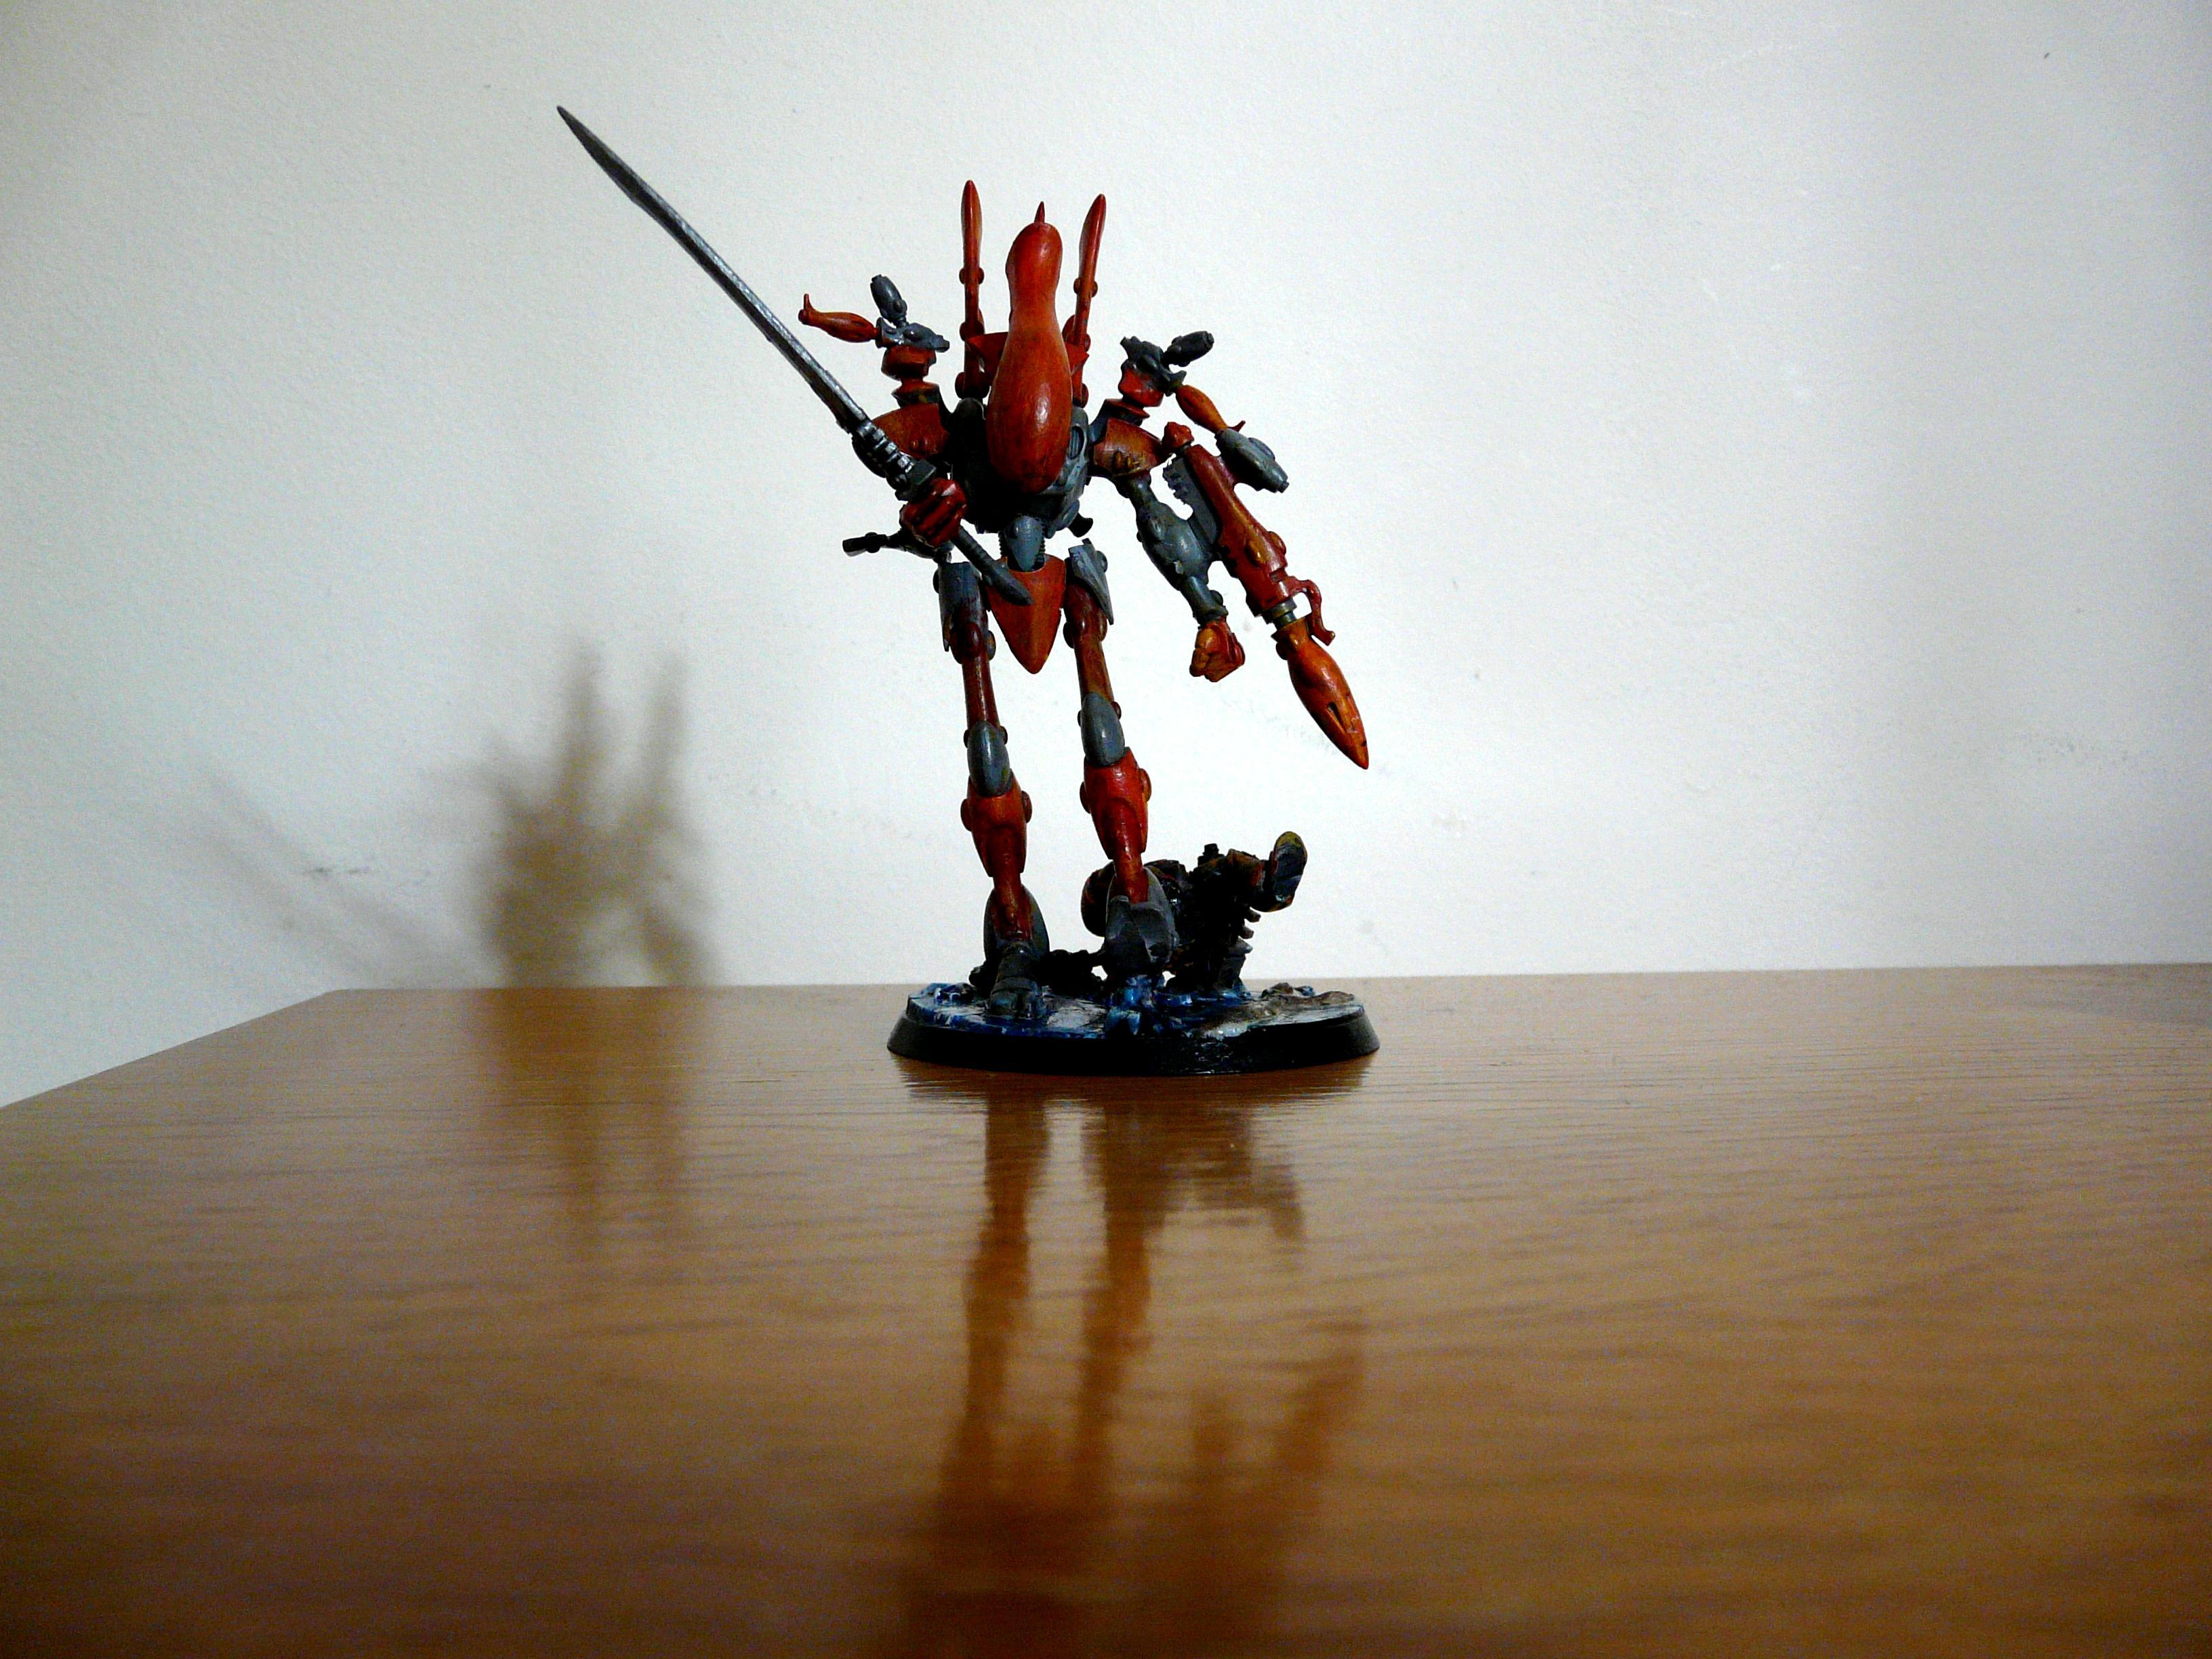 Eldar, Wraithlord, Wraithlord 2.1